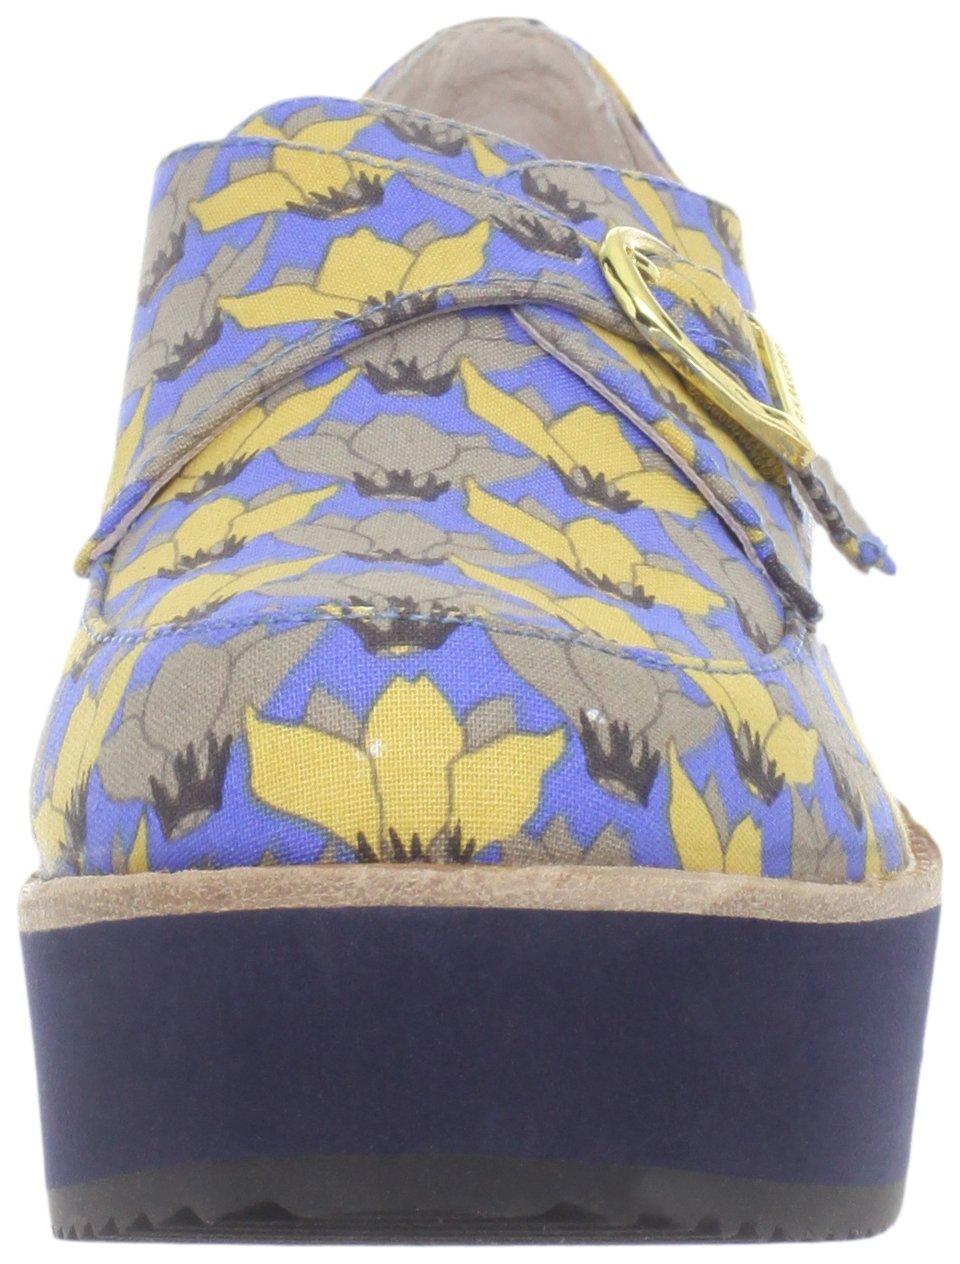 Bass Loves Rachel Antonoff Women's Fleur Loafer, Blue Floral, 6 M US by Bass Loves Rachel Antonoff (Image #4)